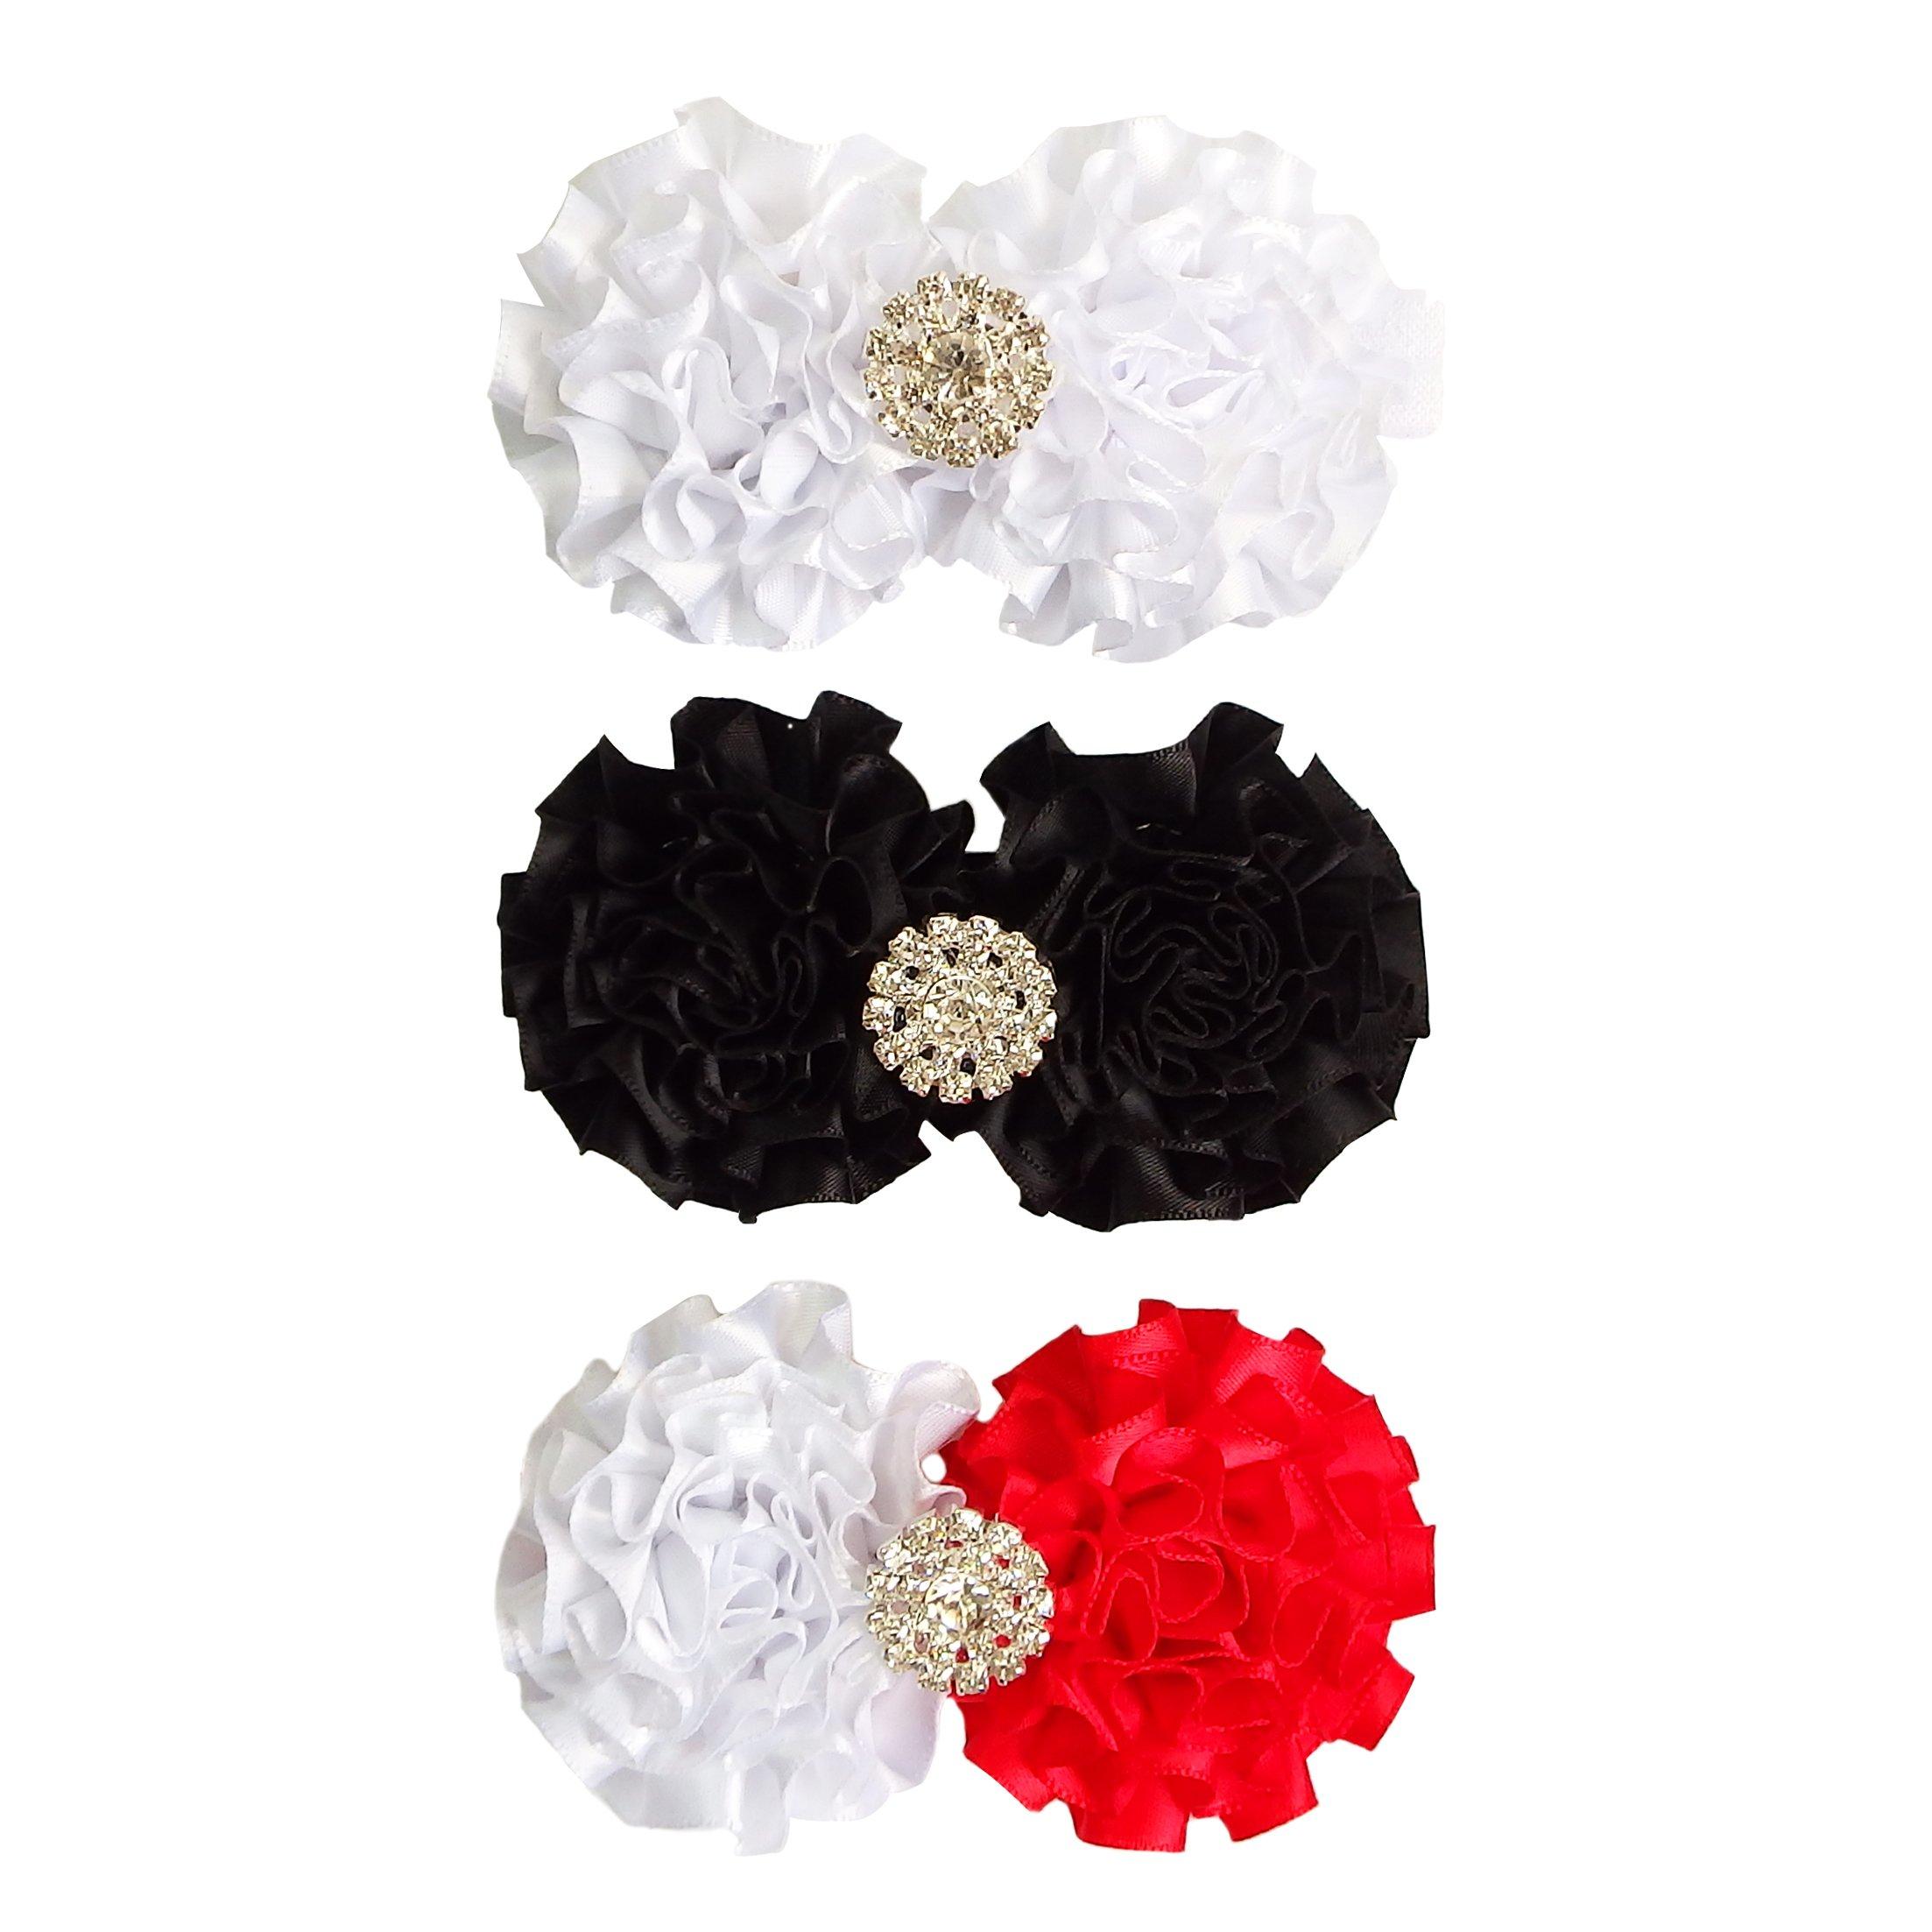 Baby Girls Headband Flower Bow Rhinestone Hair Bands Accessories 3 PCS Red White Black